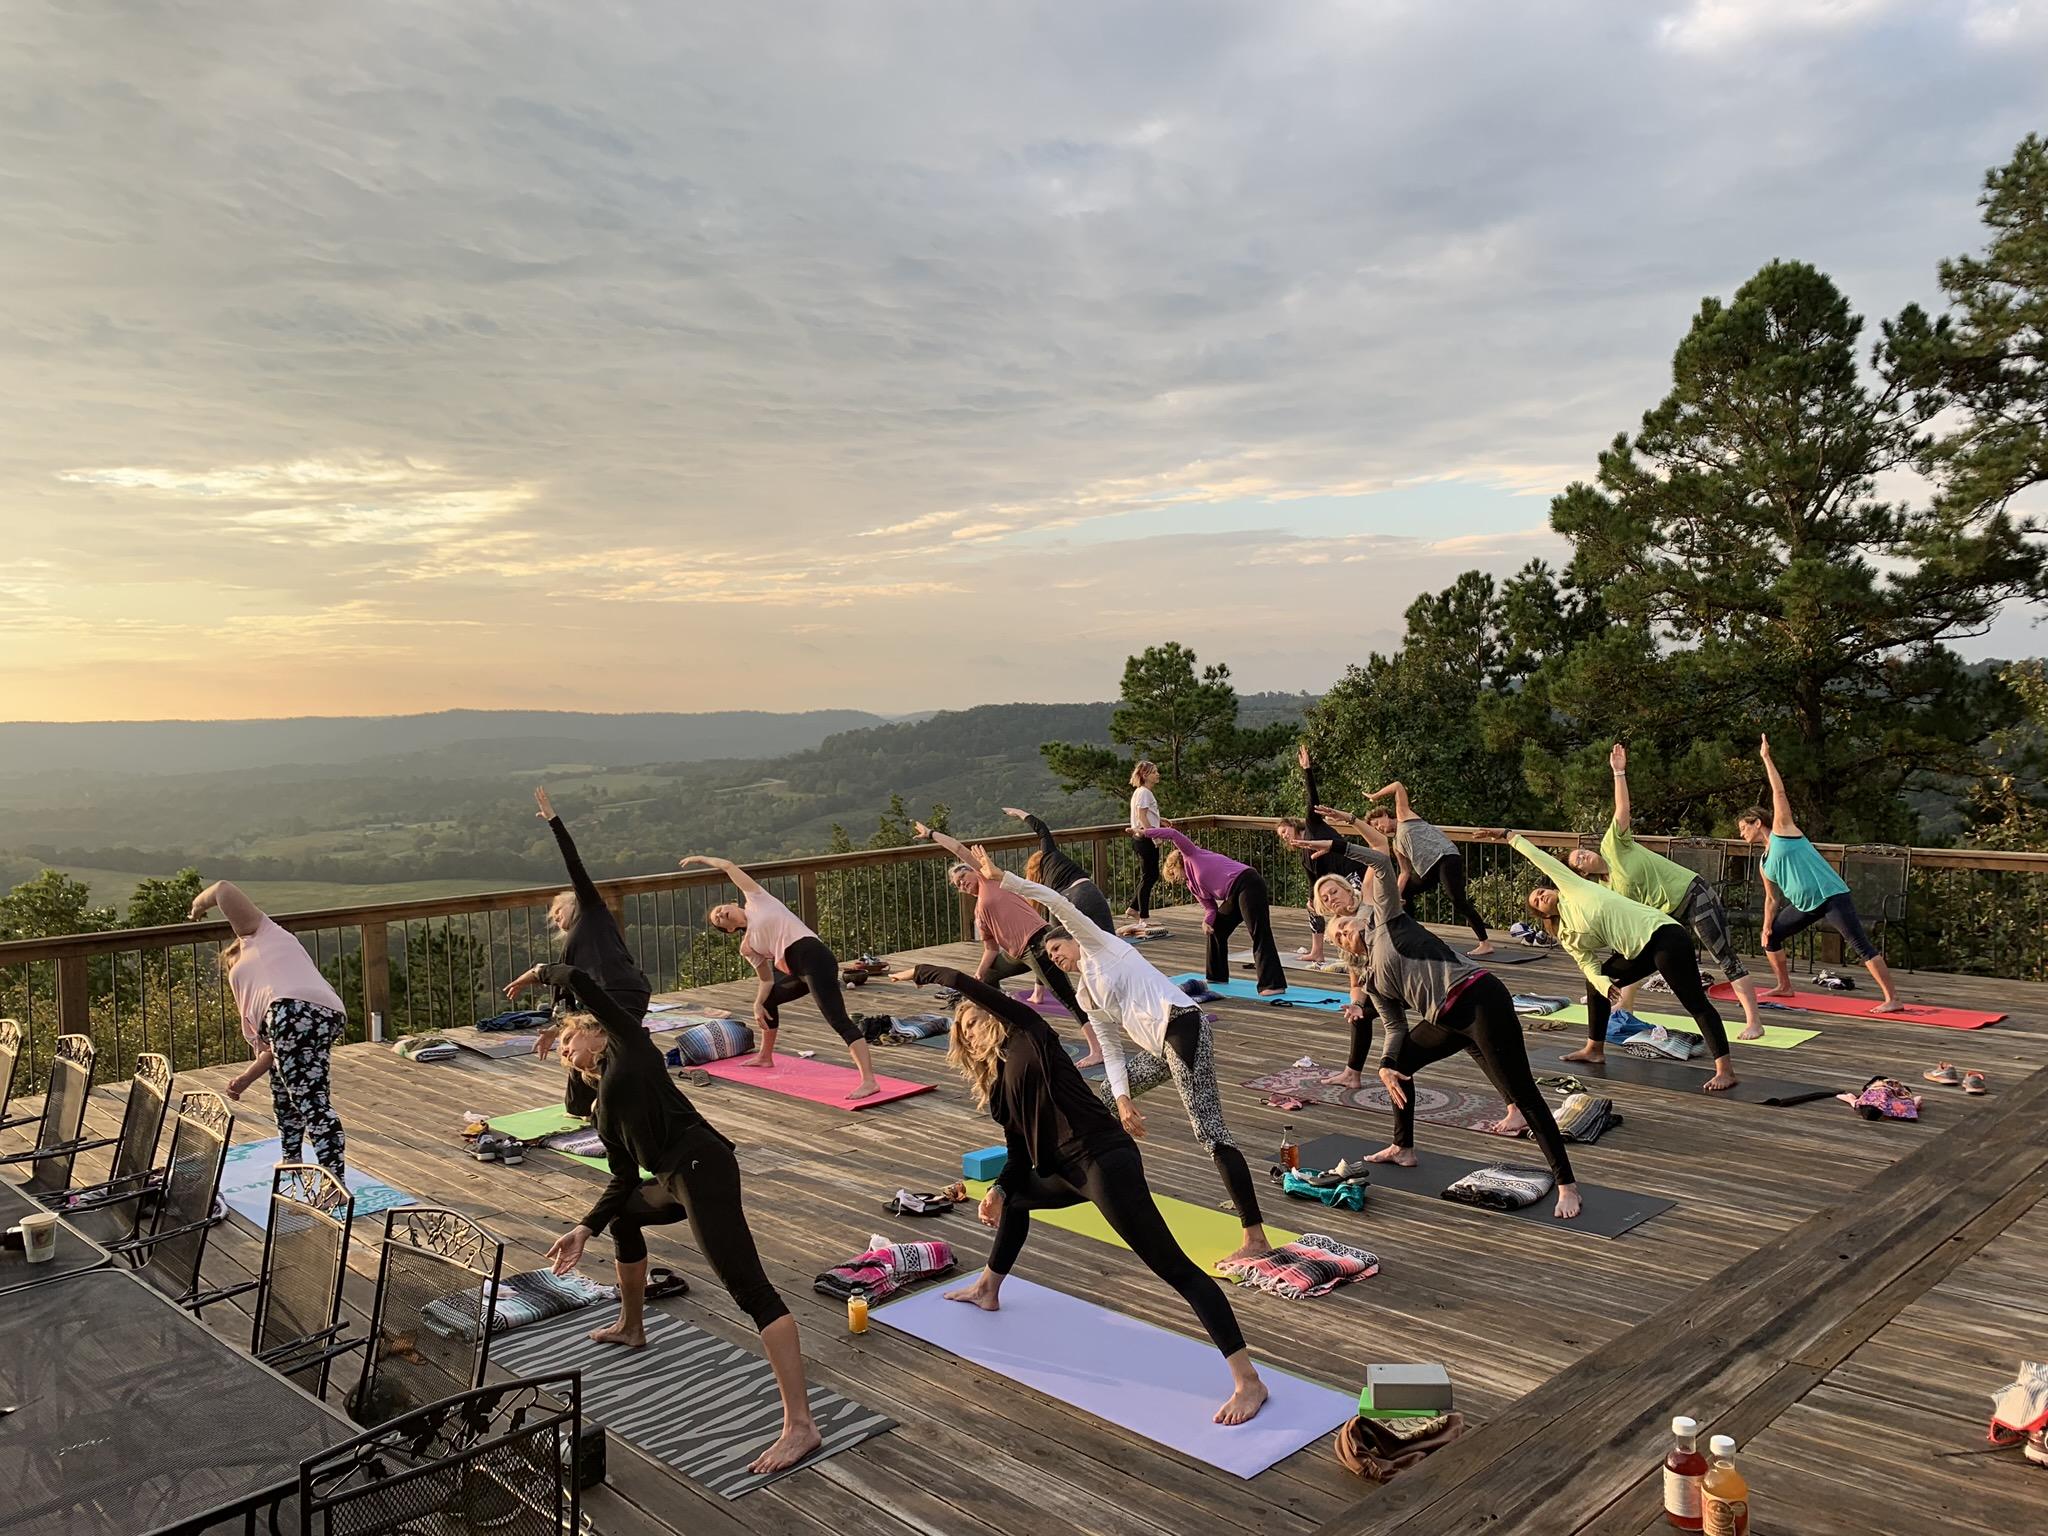 Sunrise yoga with Angela Braun